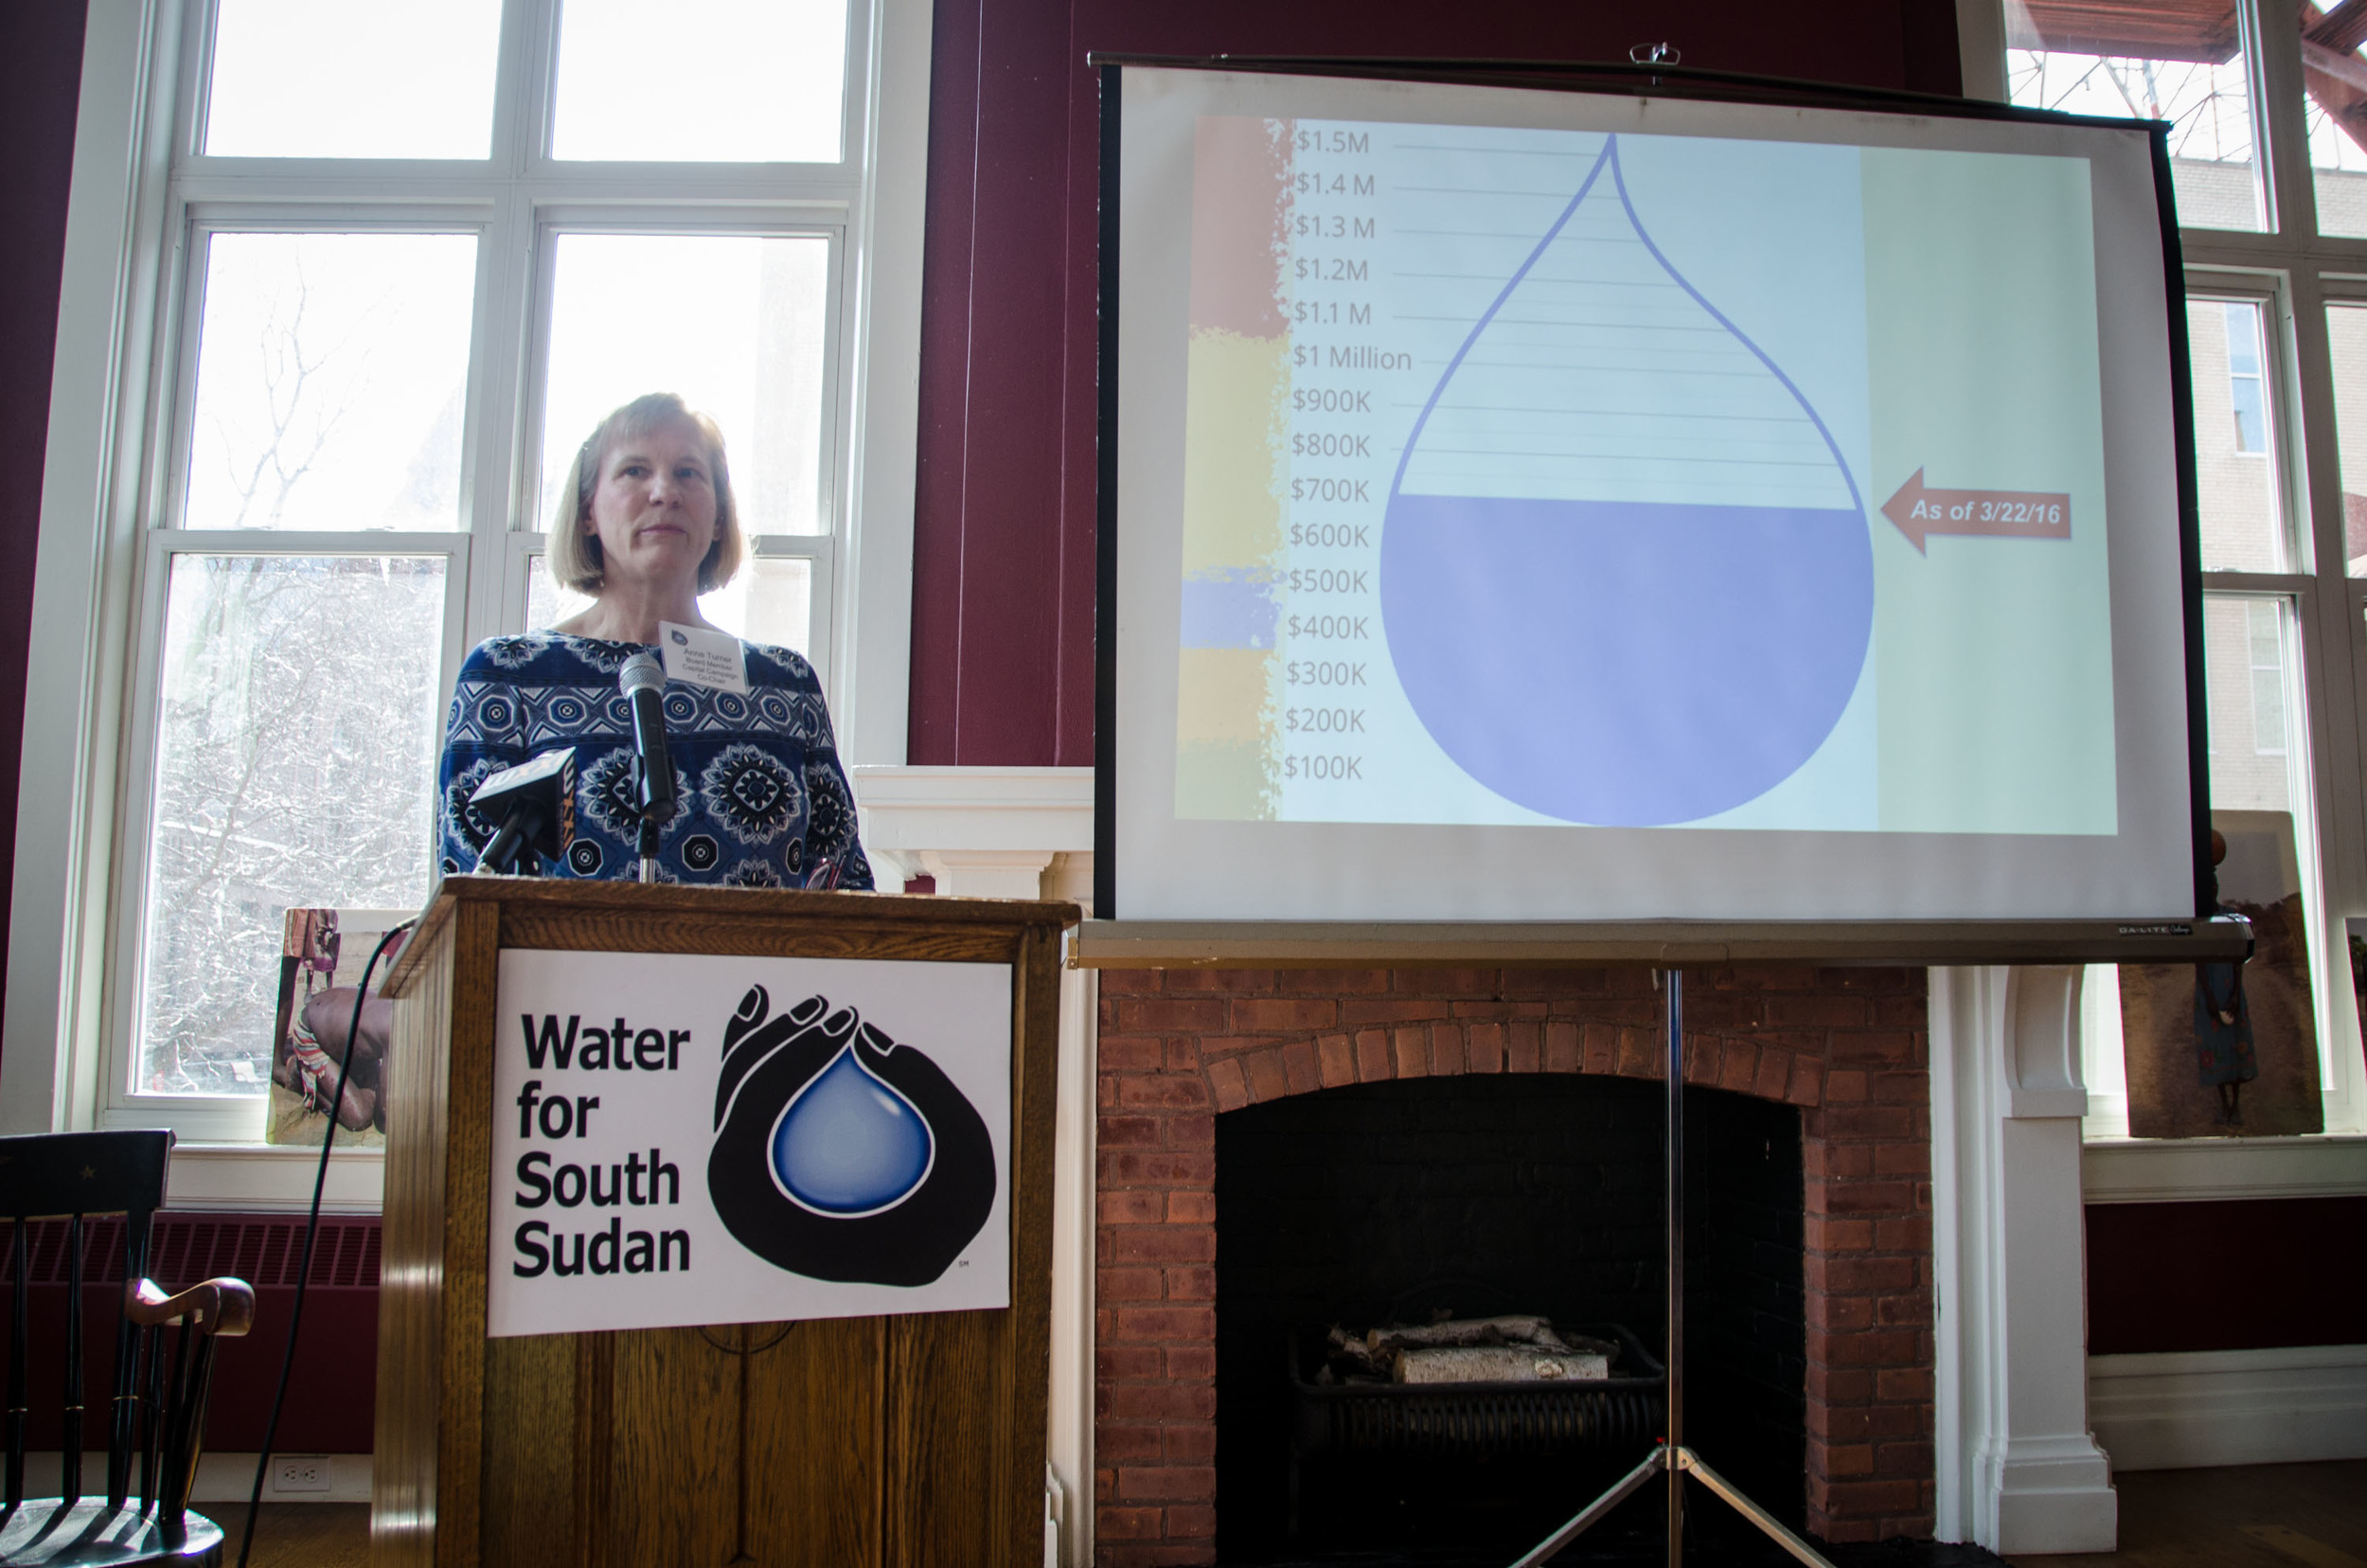 20160322-Water for South Sudan Press Conf-18.jpg